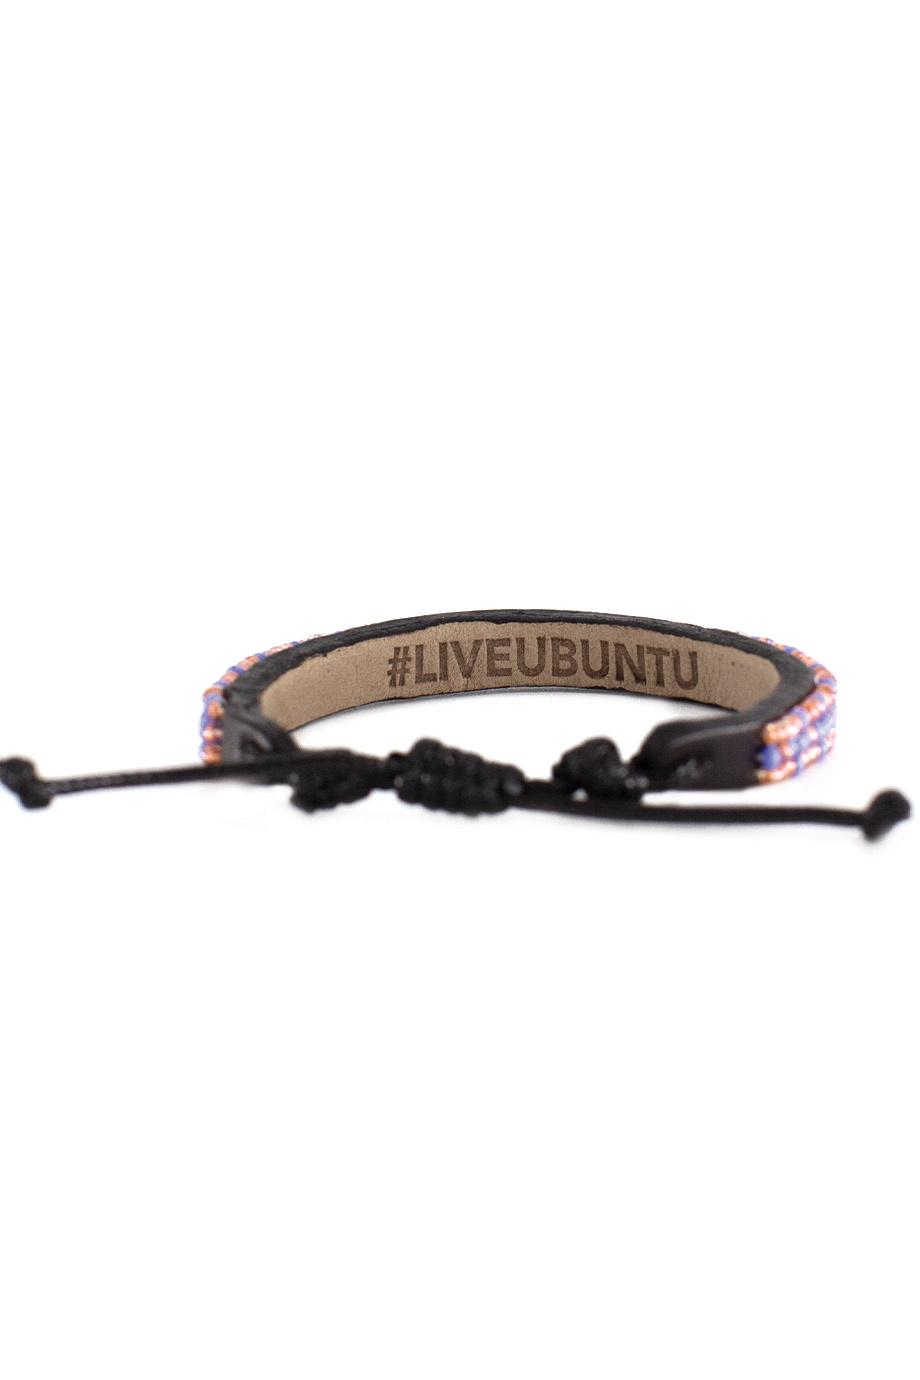 3 row Msalaba Bracelet Pearl/Periwinkle-3